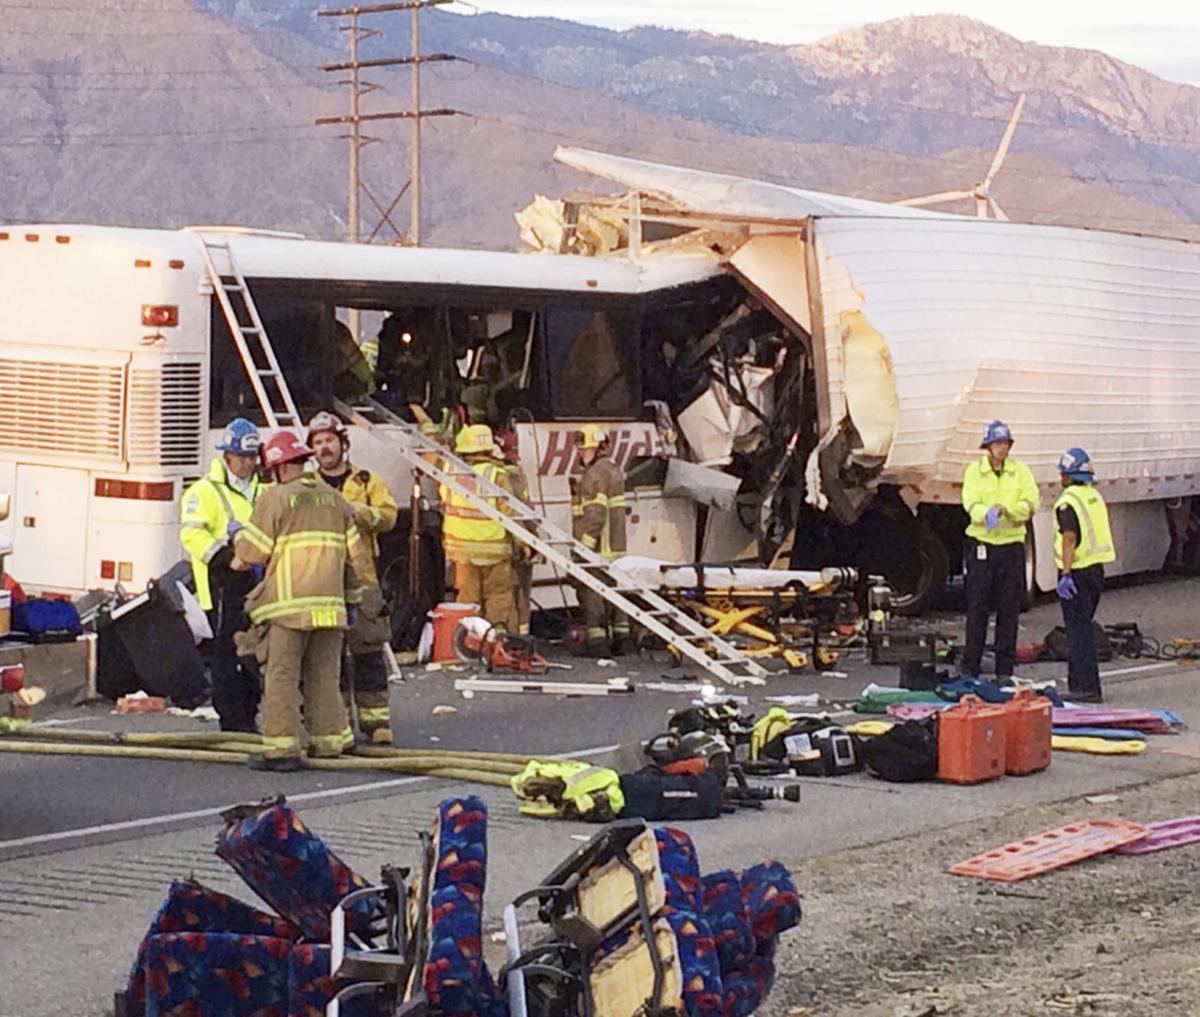 Photos: 13 Dead, 31 Injured In California Bus Crash